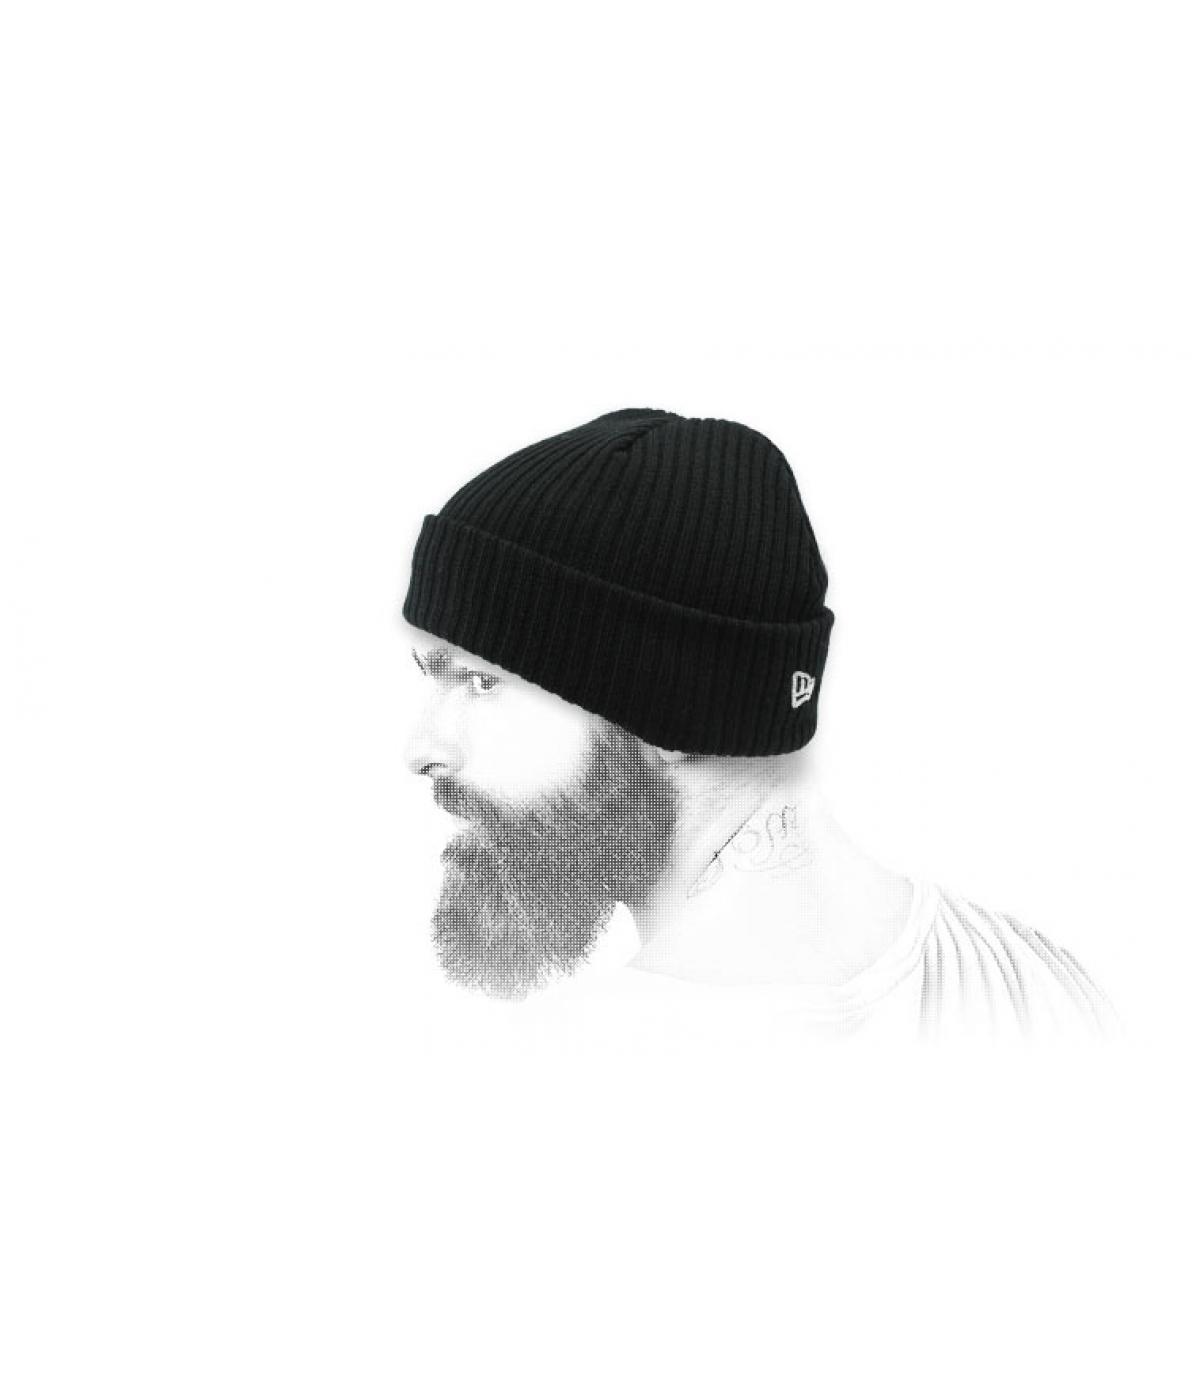 cappello docker nero